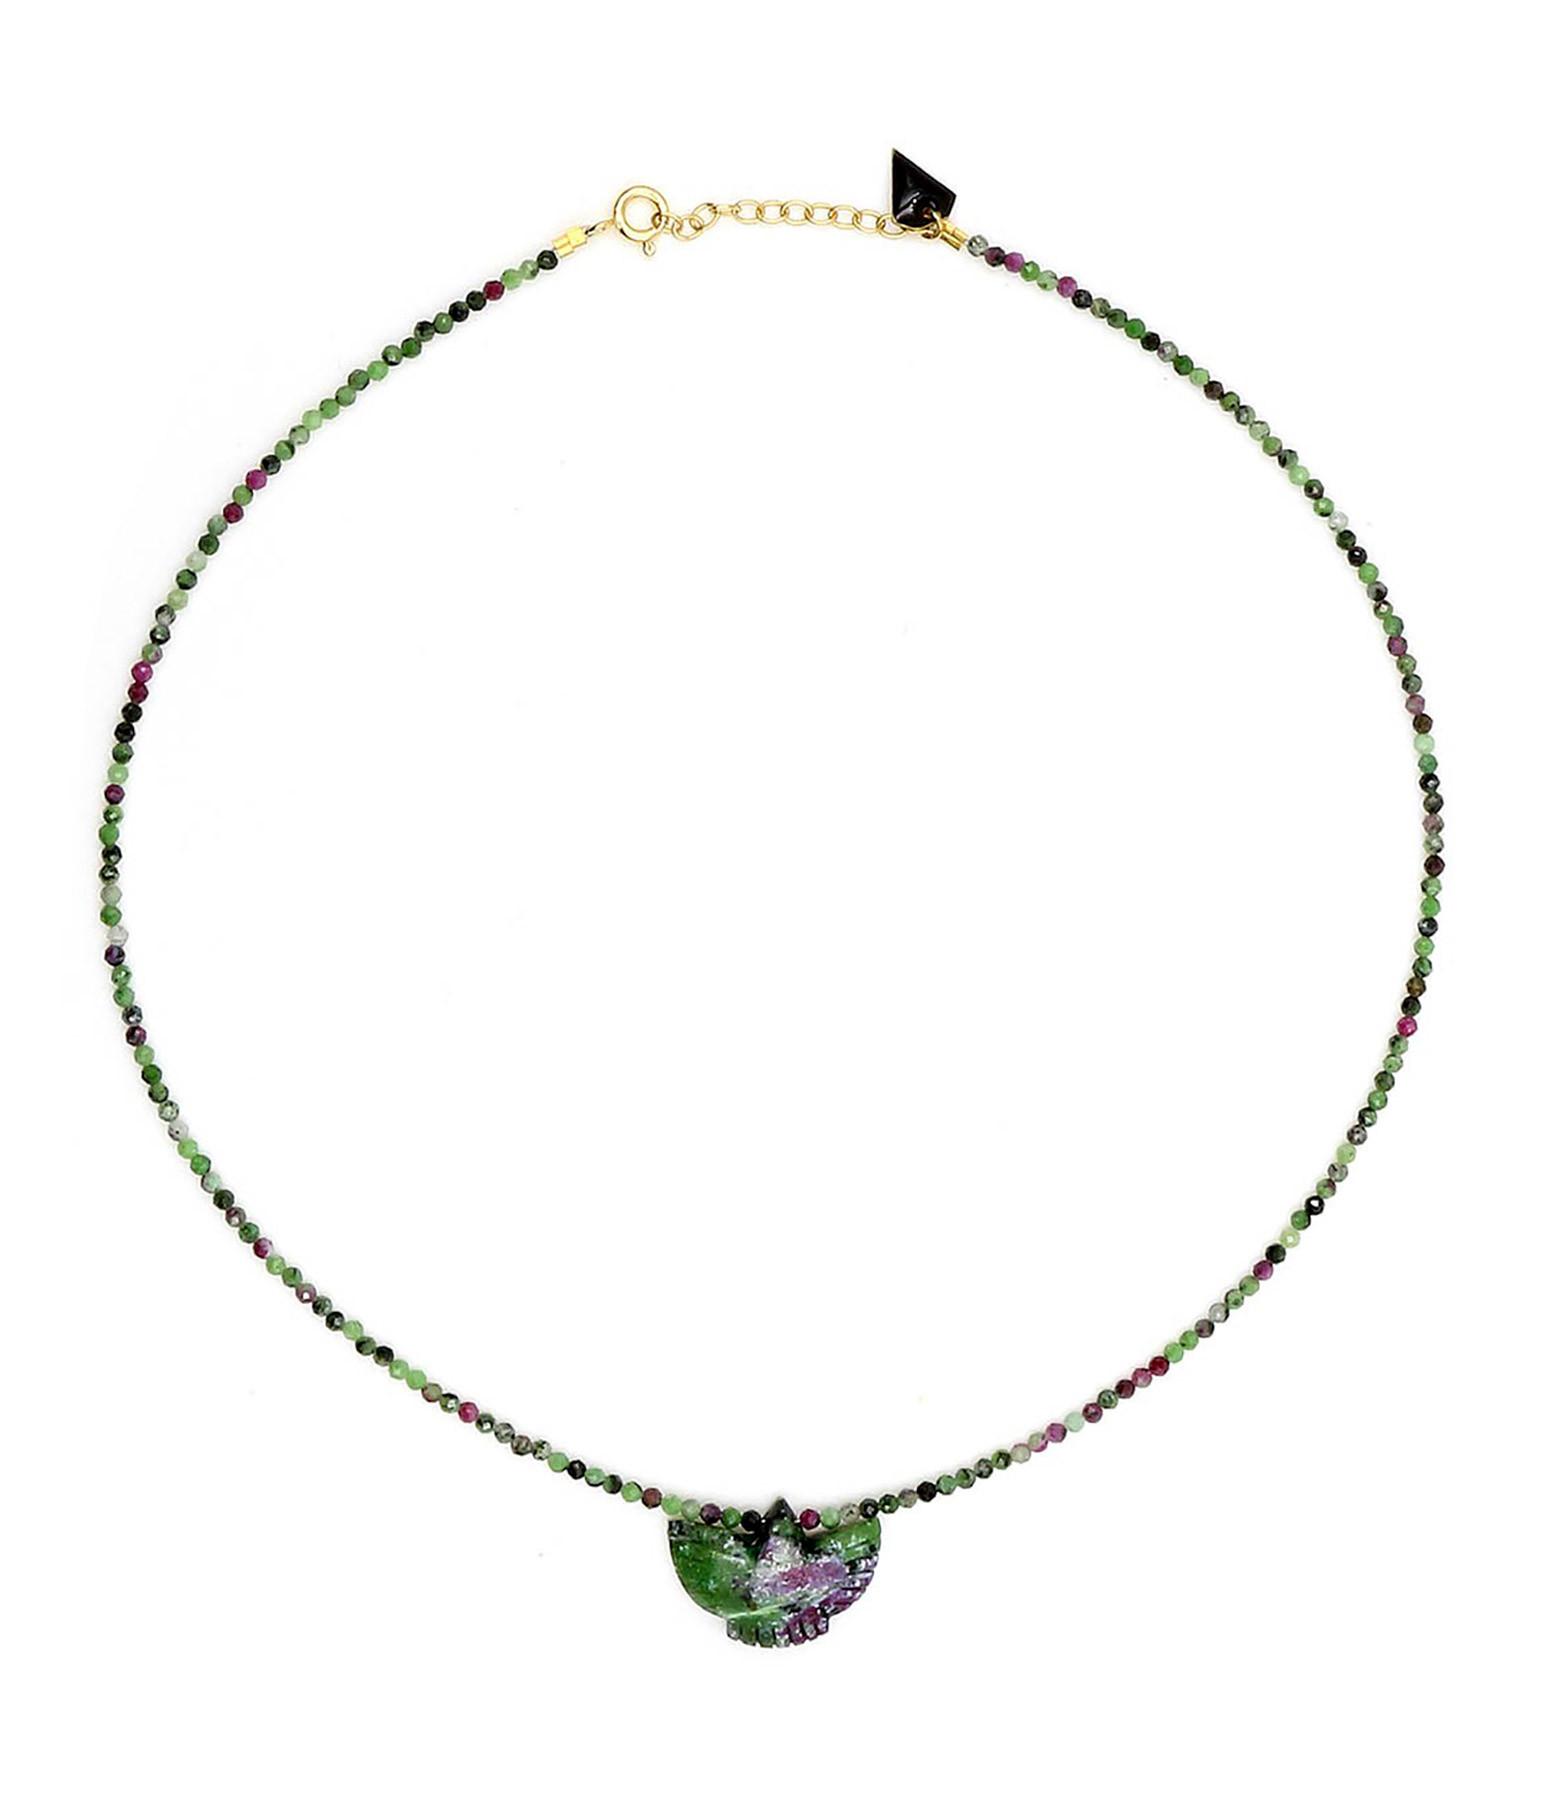 MON PRECIEUX GEM - Collier Condor Perles Rubis Zoïsite